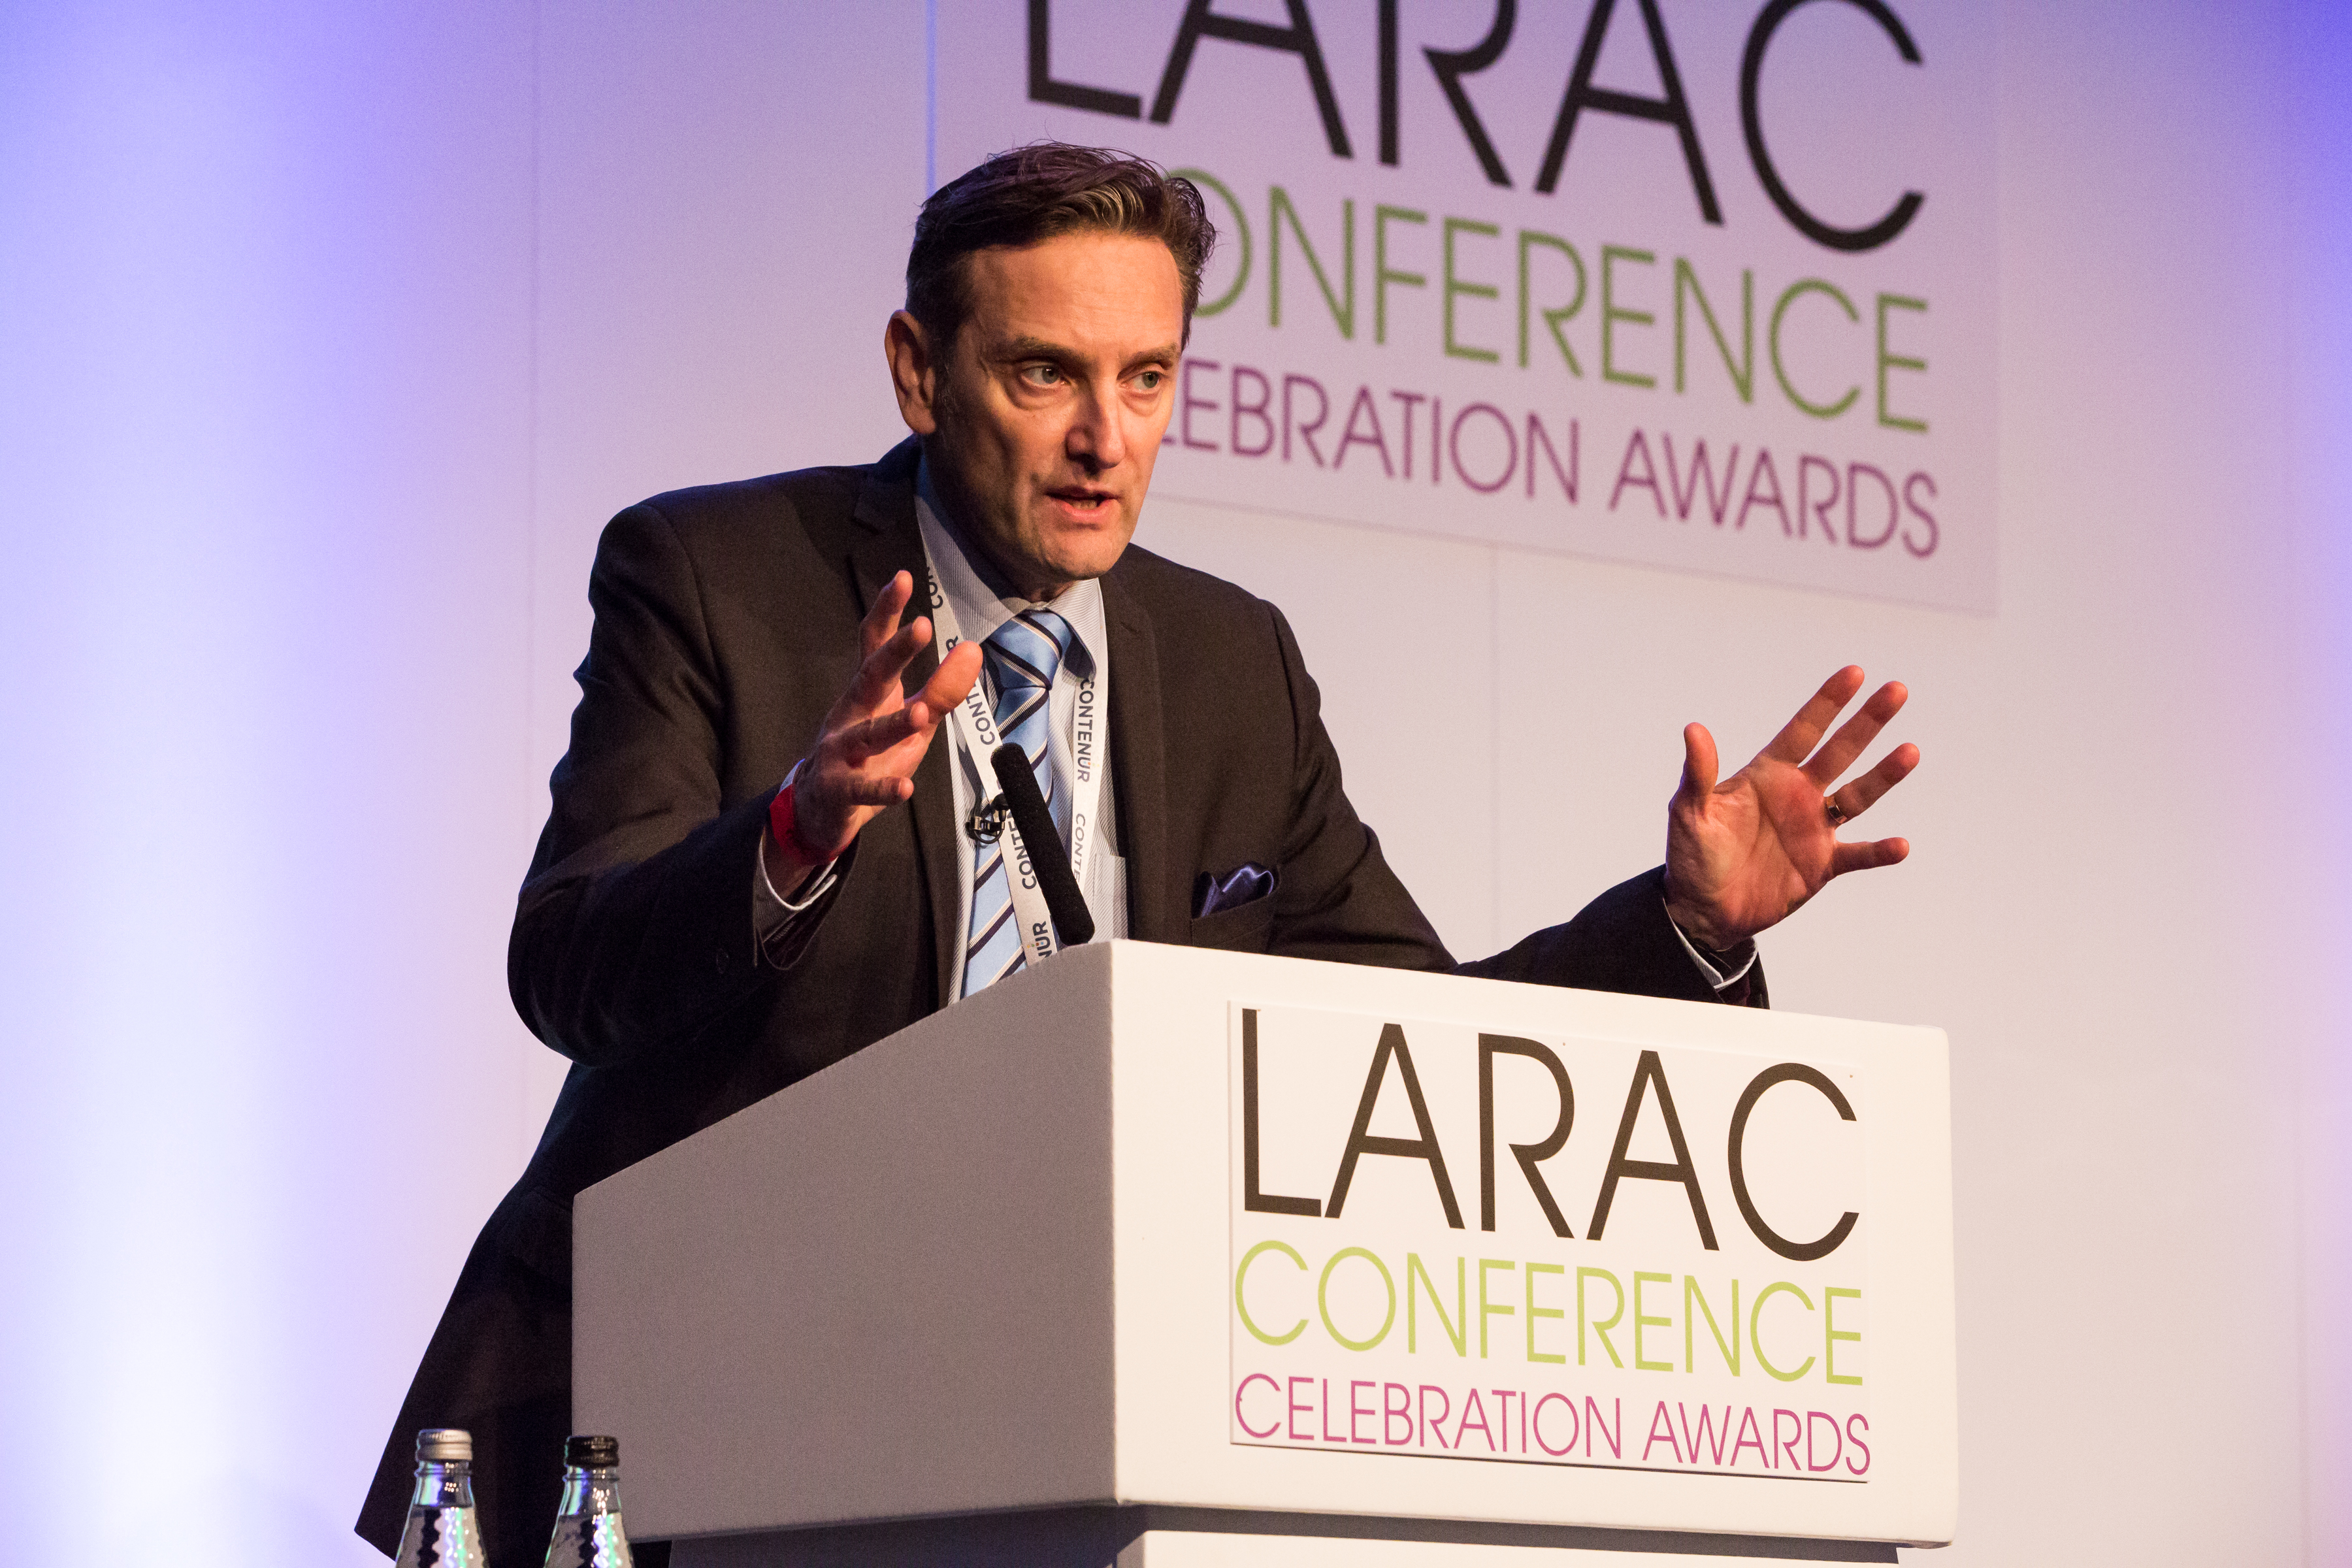 Chris Preston, Defra, at the LARAC Conference